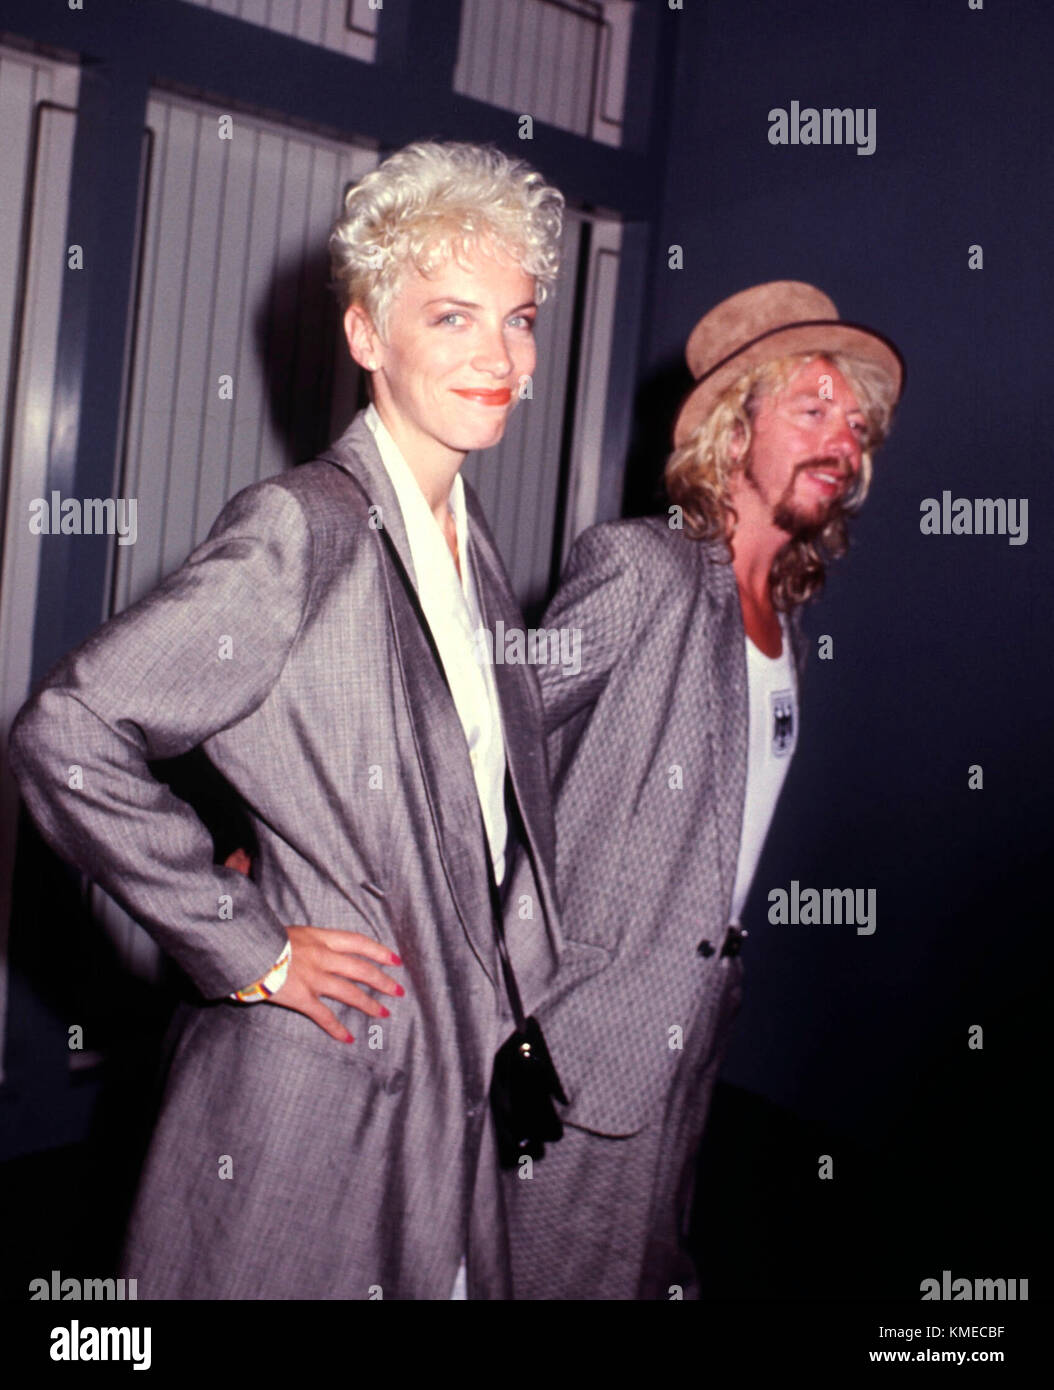 Annie Lennox And Dave Stewart Stockfotos & Annie Lennox And Dave ...